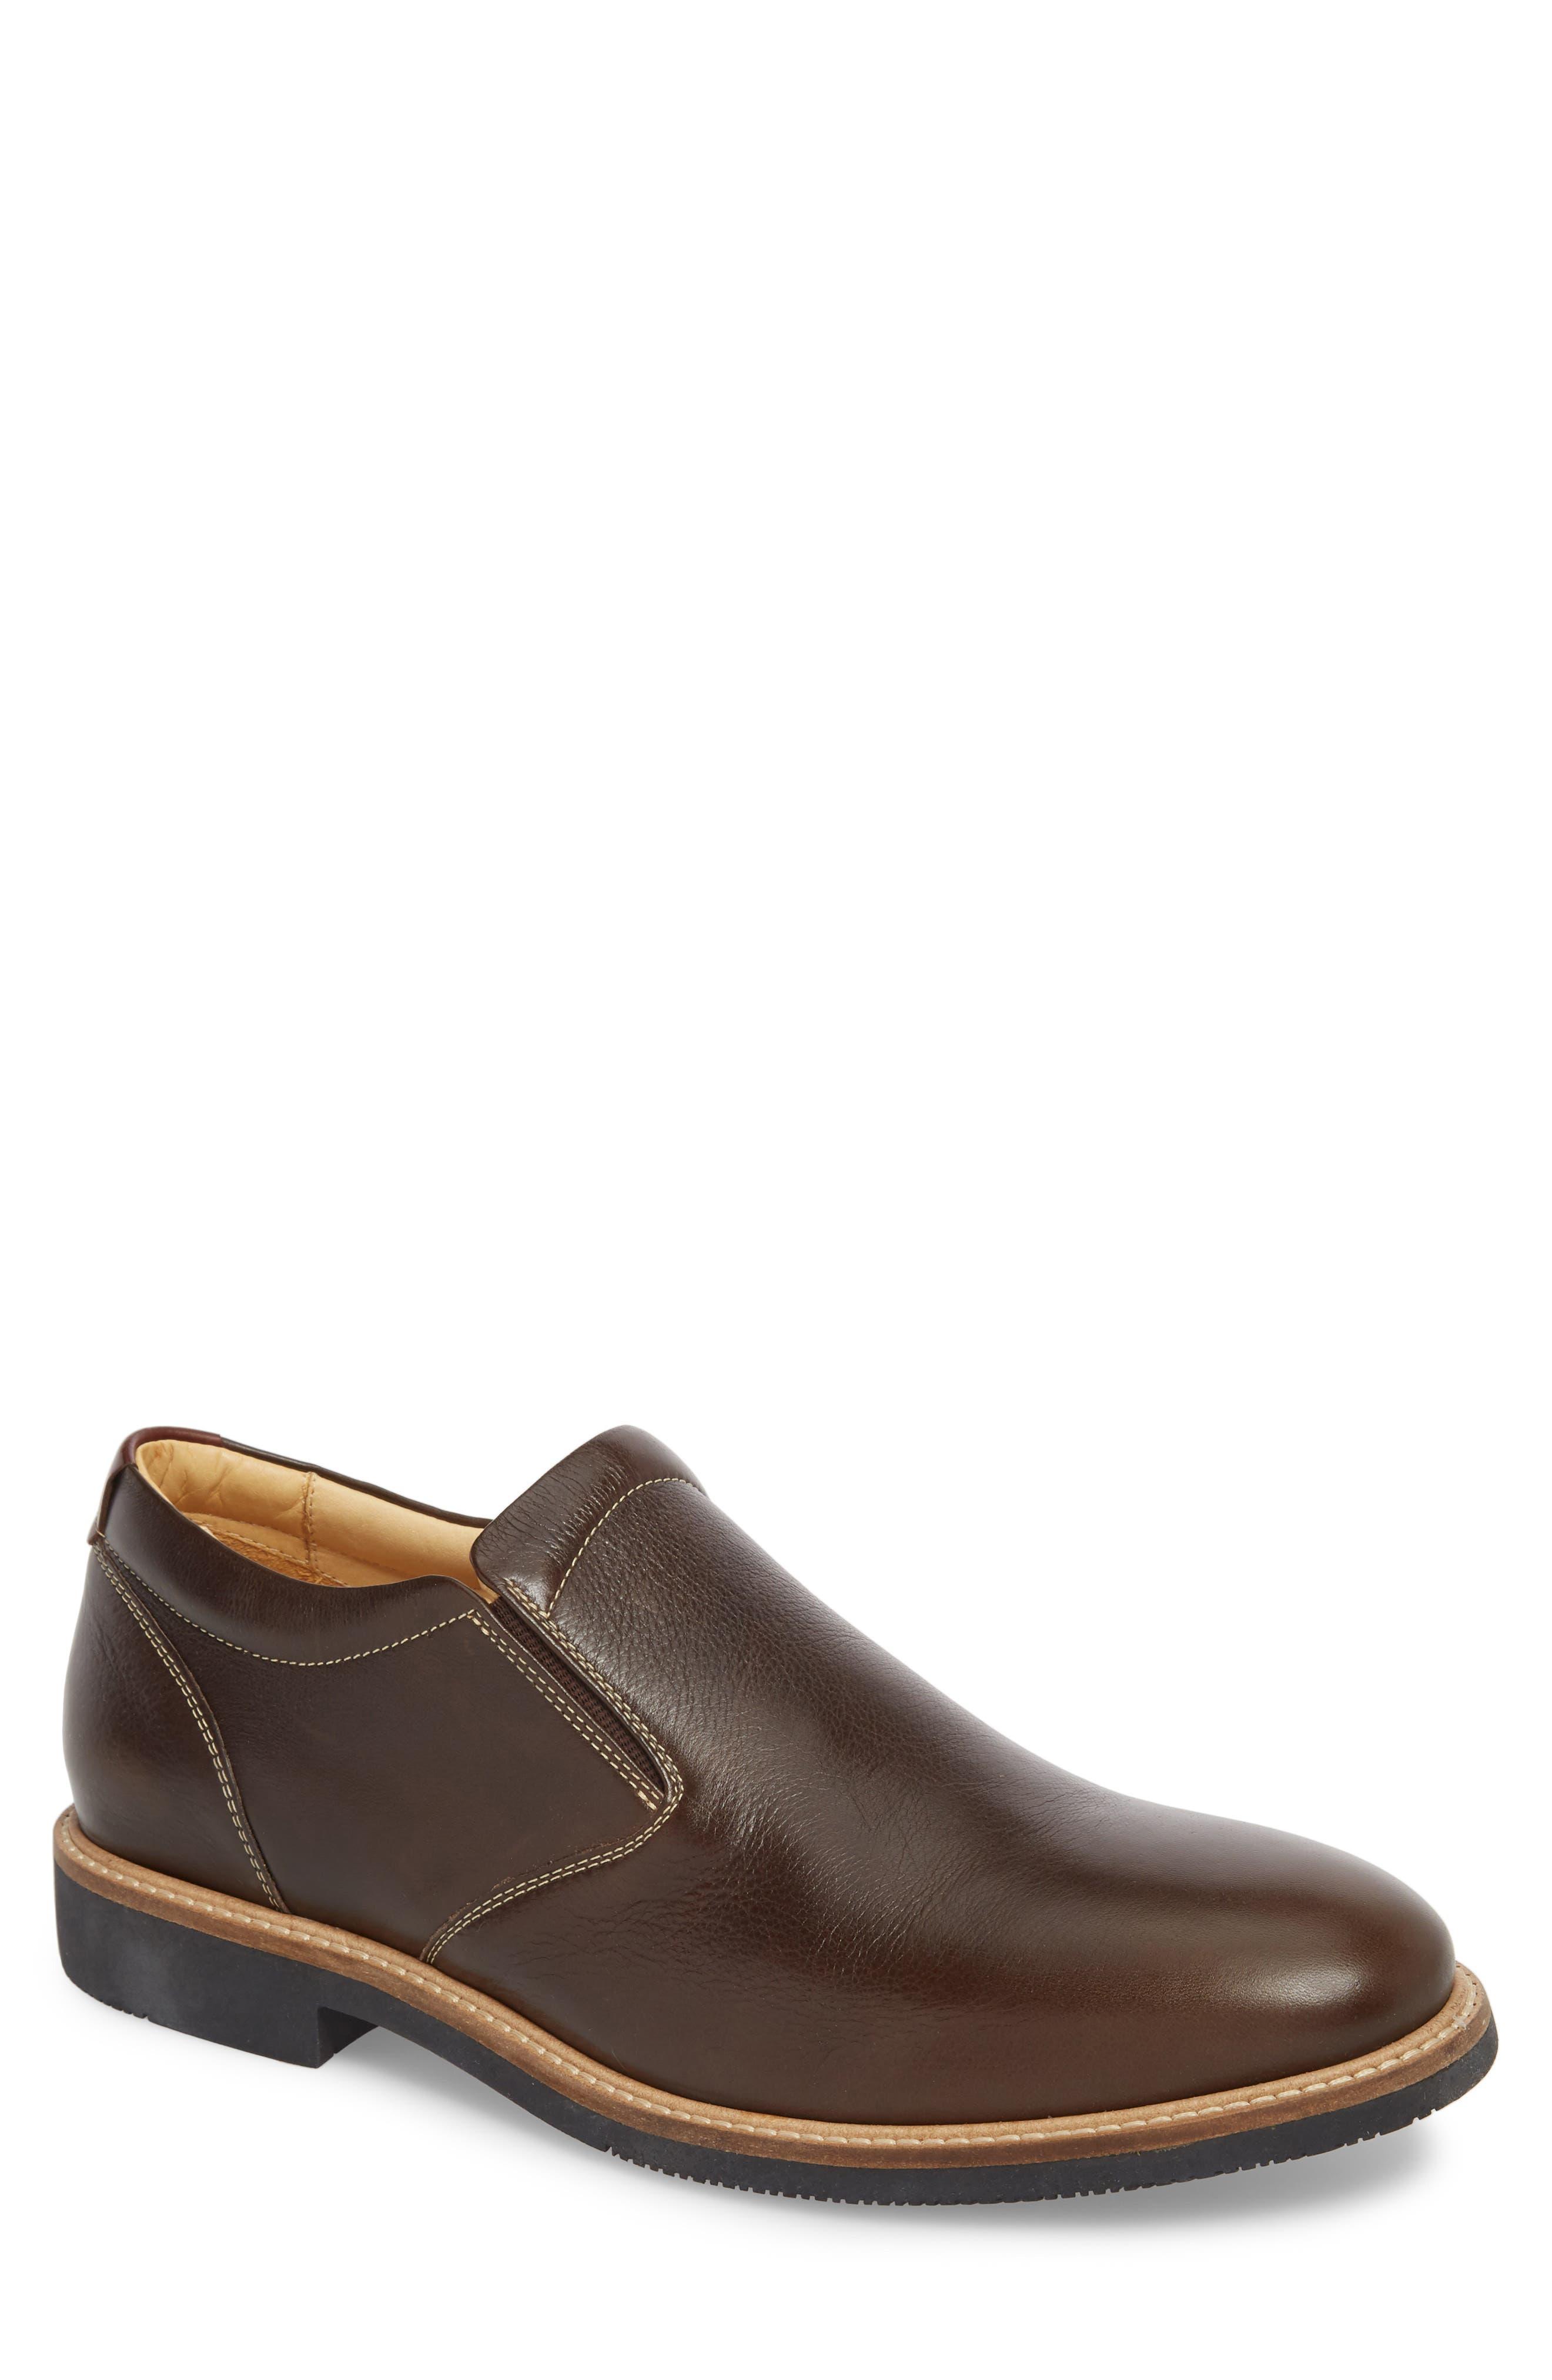 JOHNSTON & MURPHY Barlow Plain Toe Slip-On, Main, color, DARK BROWN LEATHER